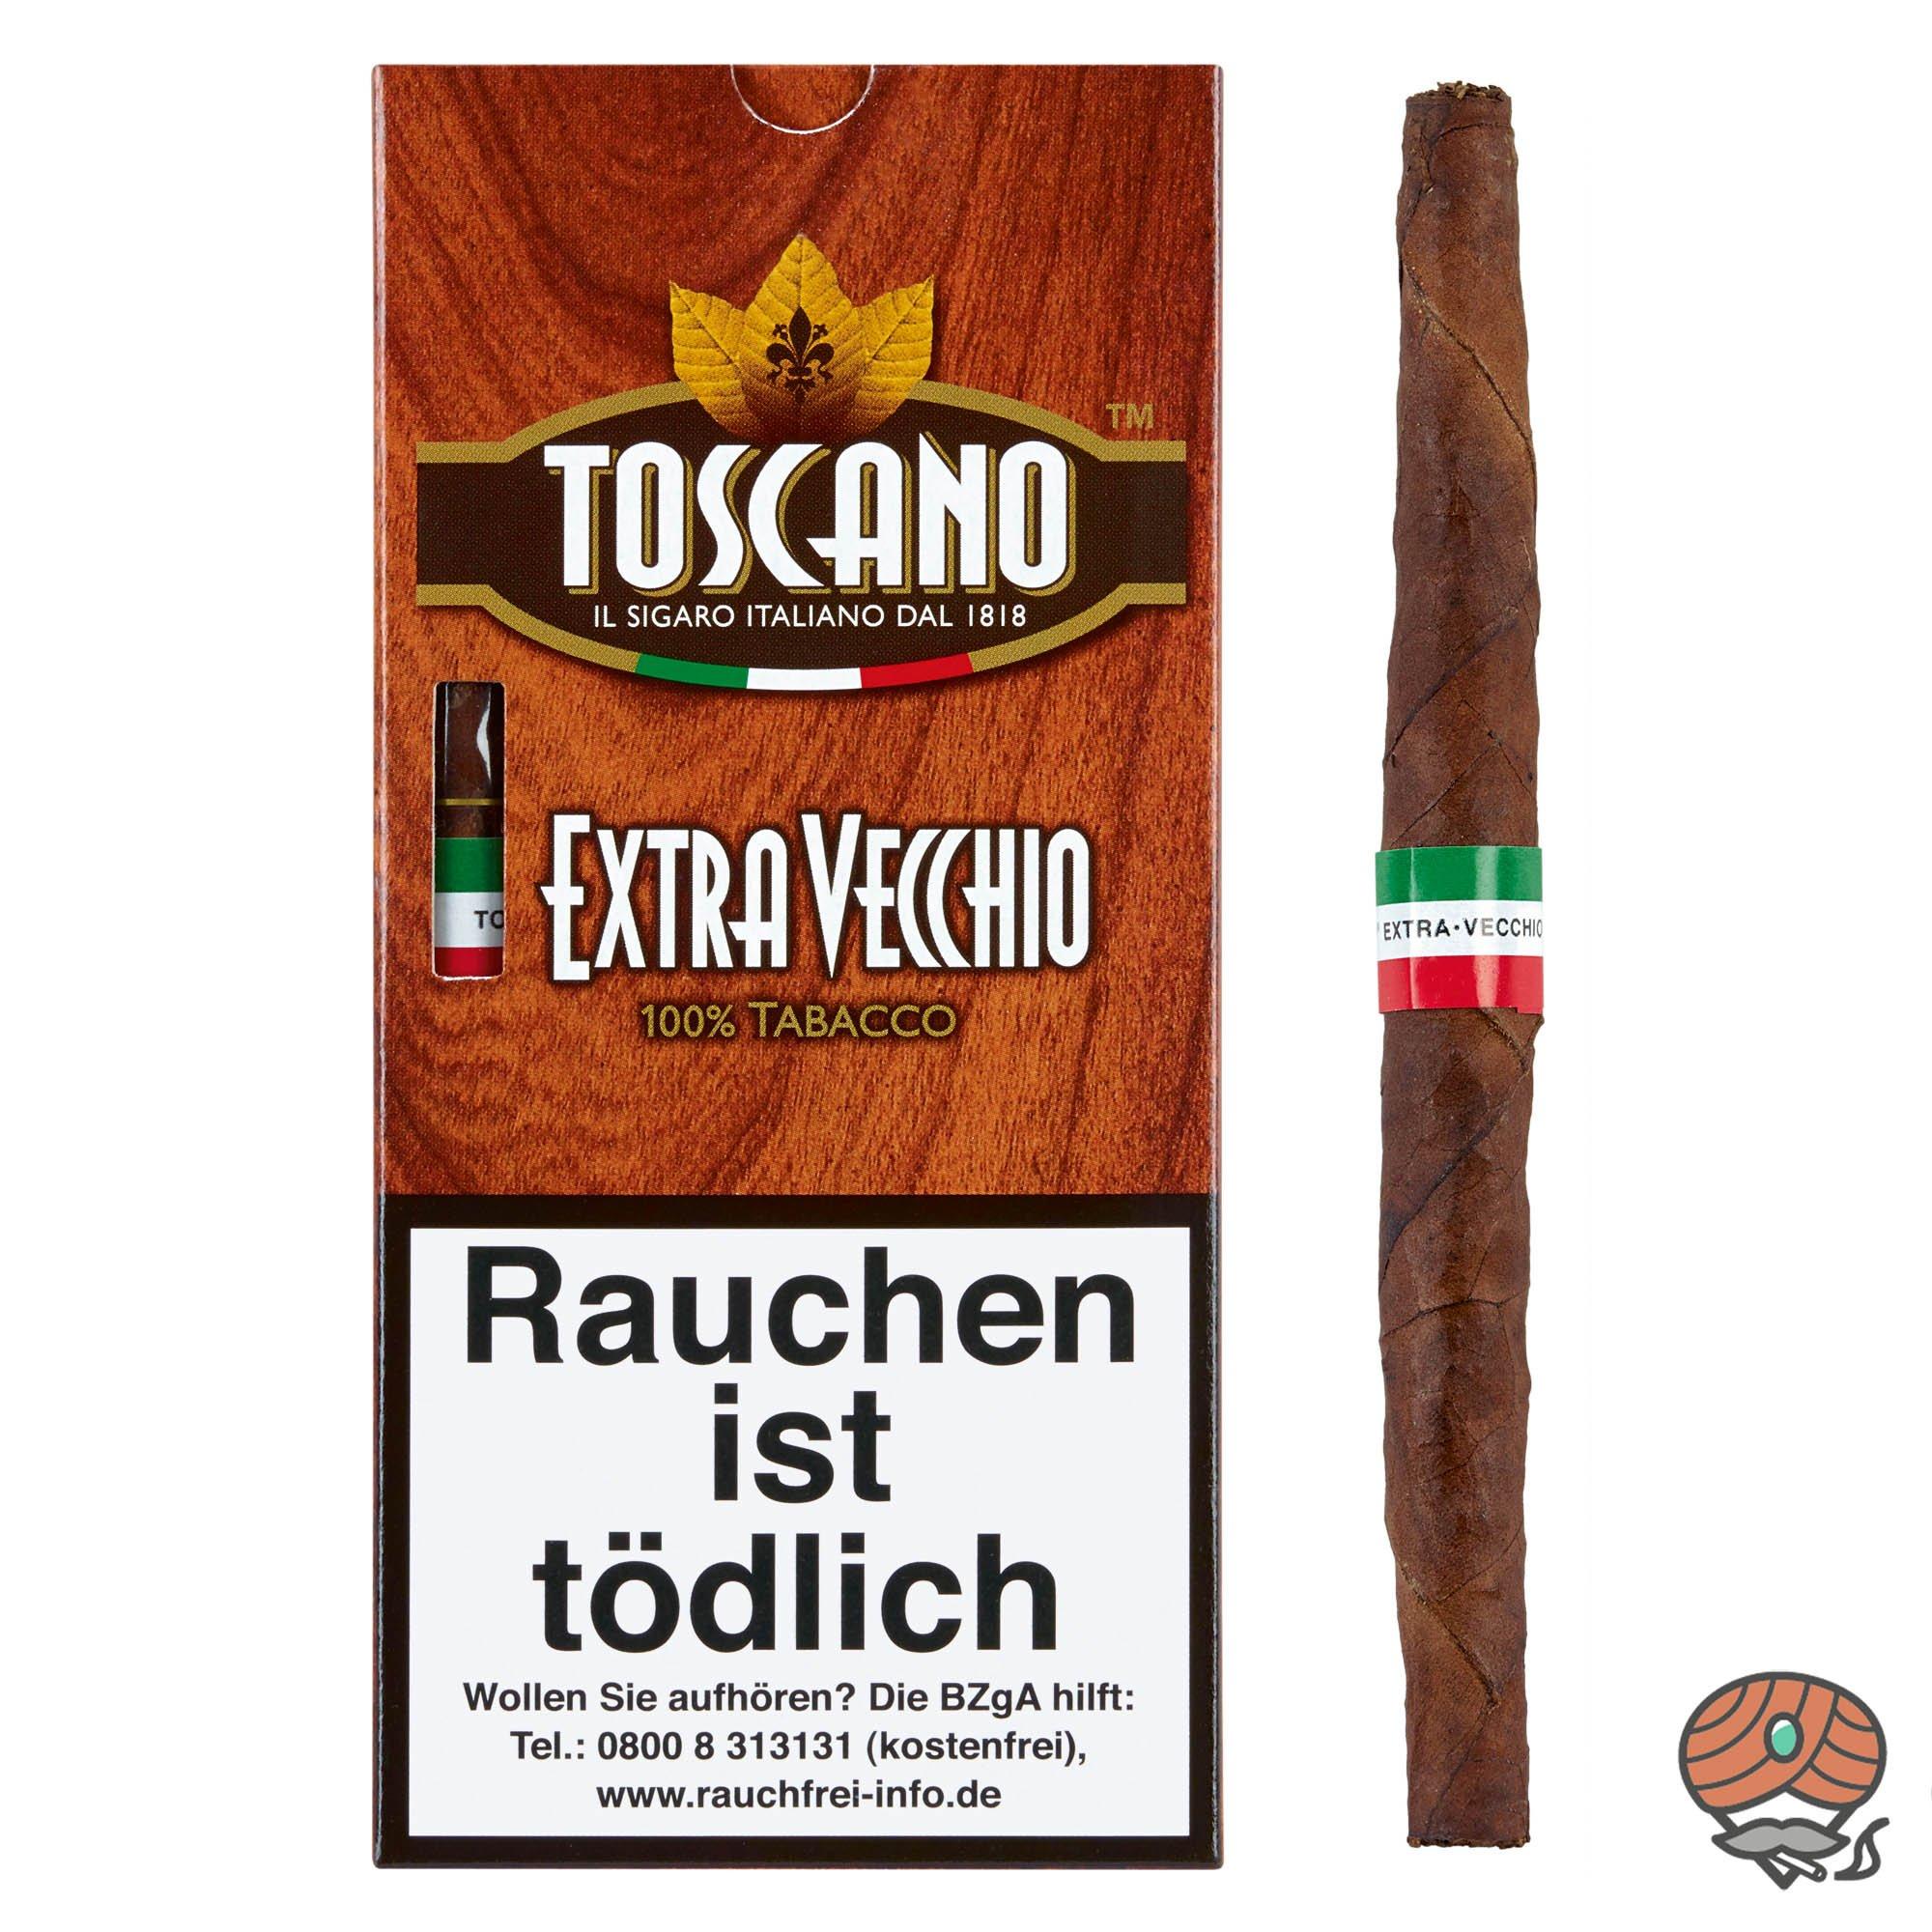 Toscano Extra Vecchio 100% Tabacco Zigarren Inhalt 5 Stück